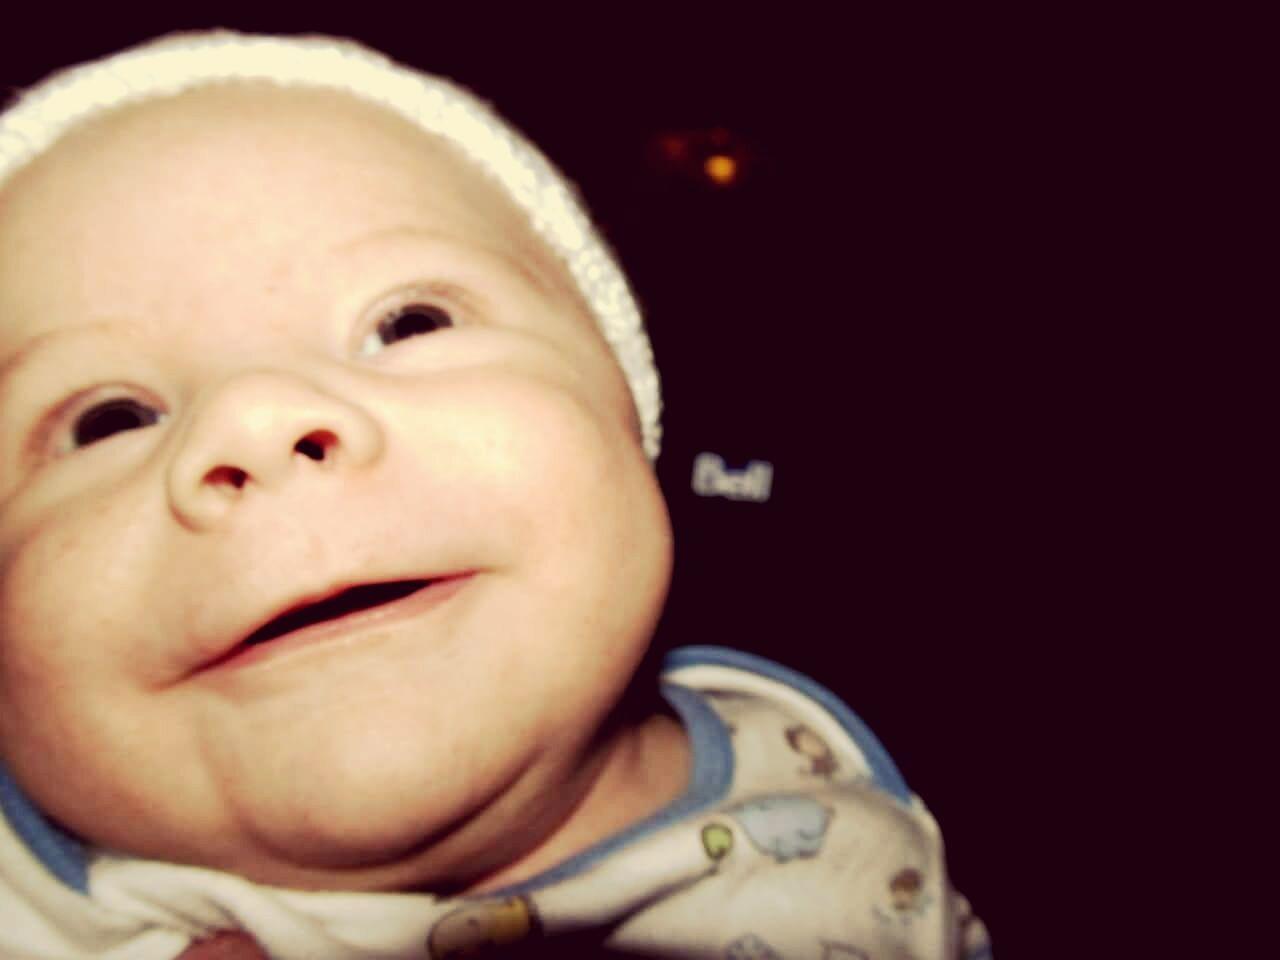 My baby boy ❤😘 Soyoung Cutie Enjoying Life Cheesin' Love♥ Mybabyboy❤️❤️❤️❤️